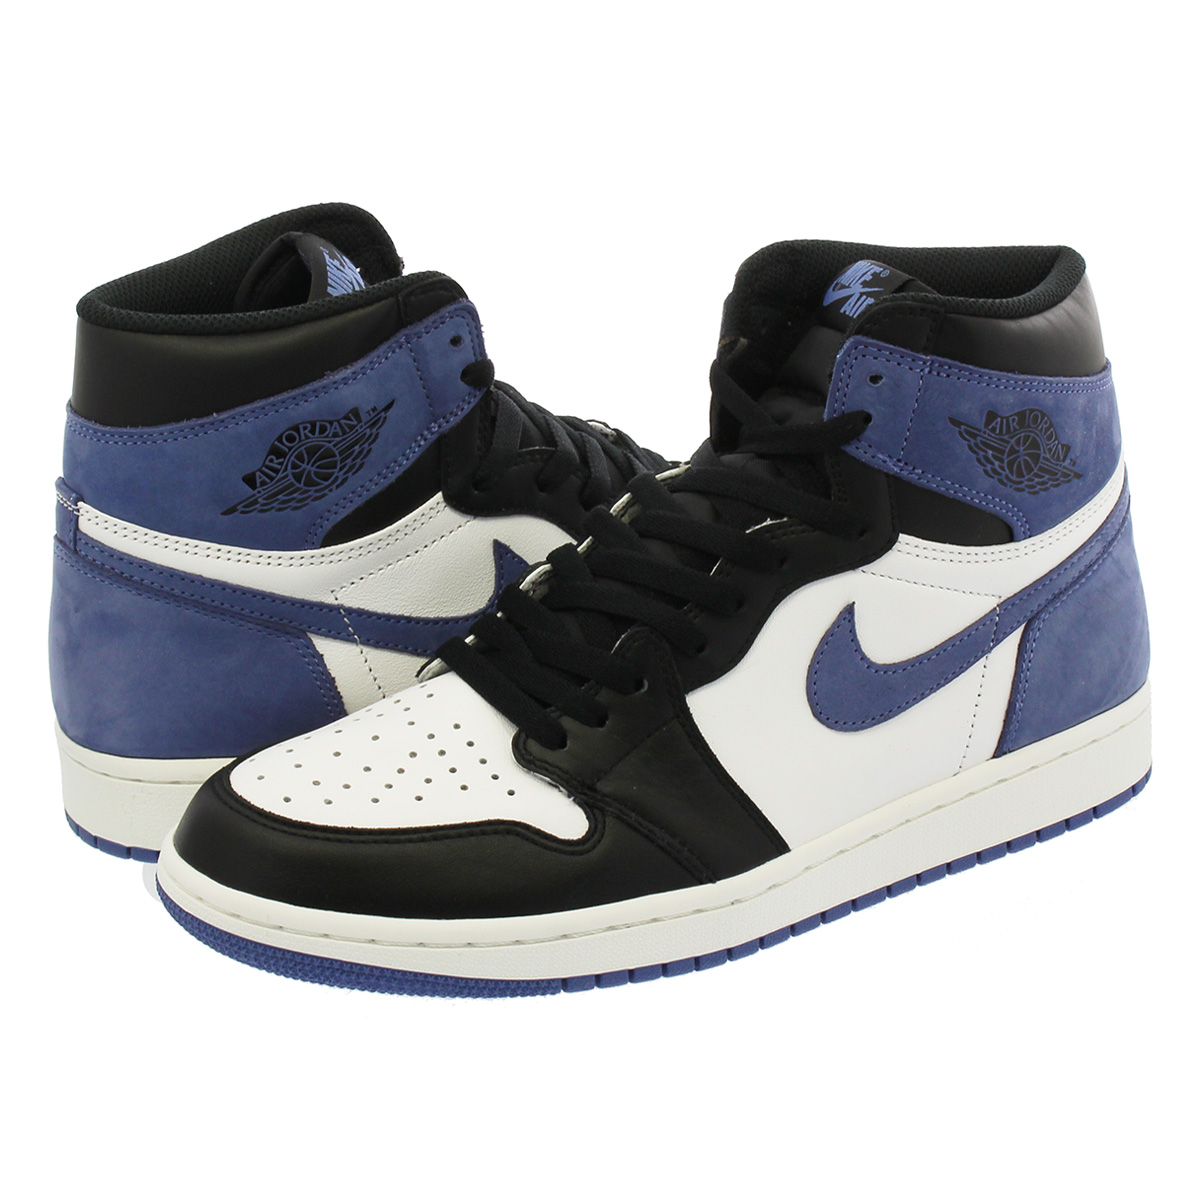 the latest c0e66 5f733 NIKE AIR JORDAN 1 RETRO HIGH OG Nike Air Jordan 1 nostalgic high OG SUMMIT  WHITE/BLUE MOON/BLACK 555,088-115